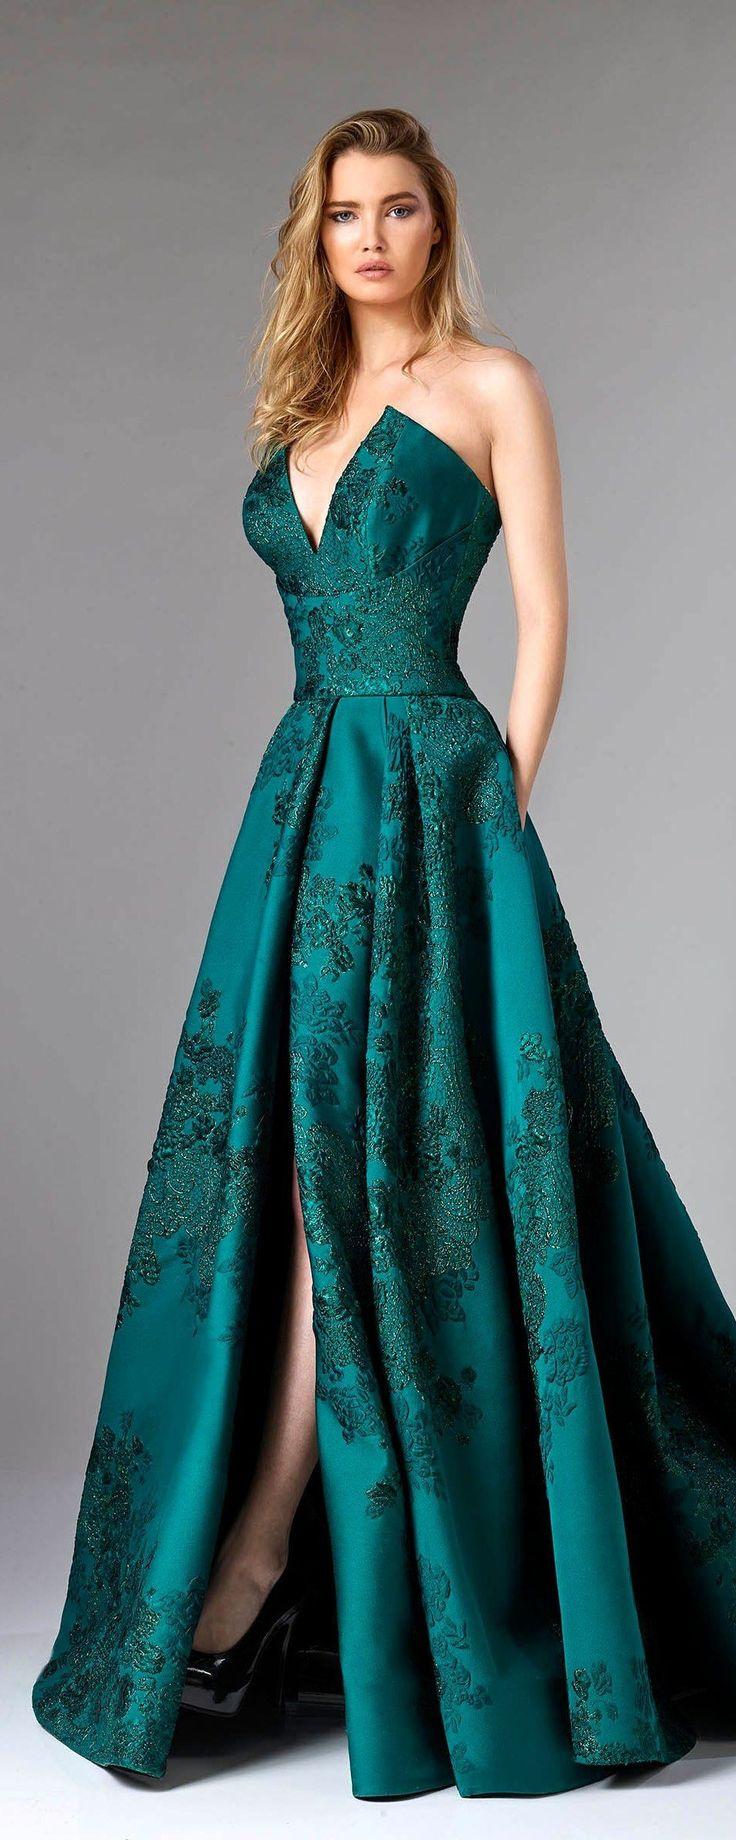 915 best ♥♥2018 New Arrival Prom Dresses!! images on Pinterest ...